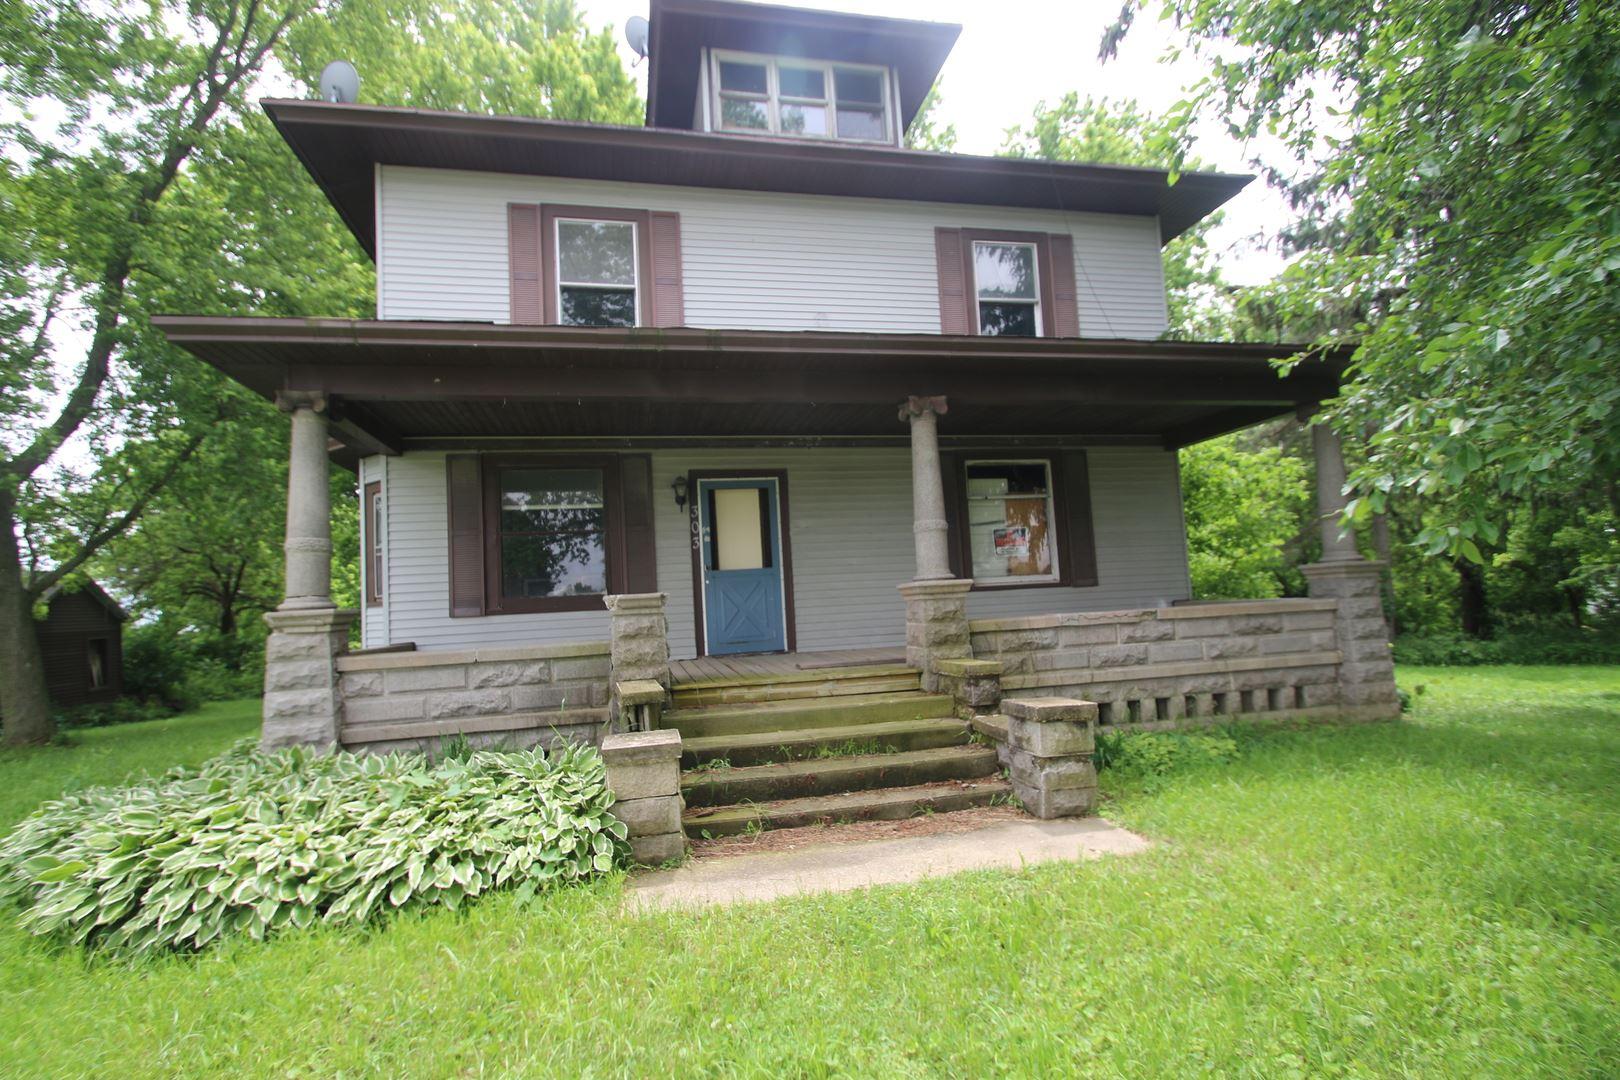 303 E Edson Street, Poplar Grove, IL 61065 - #: 10426551